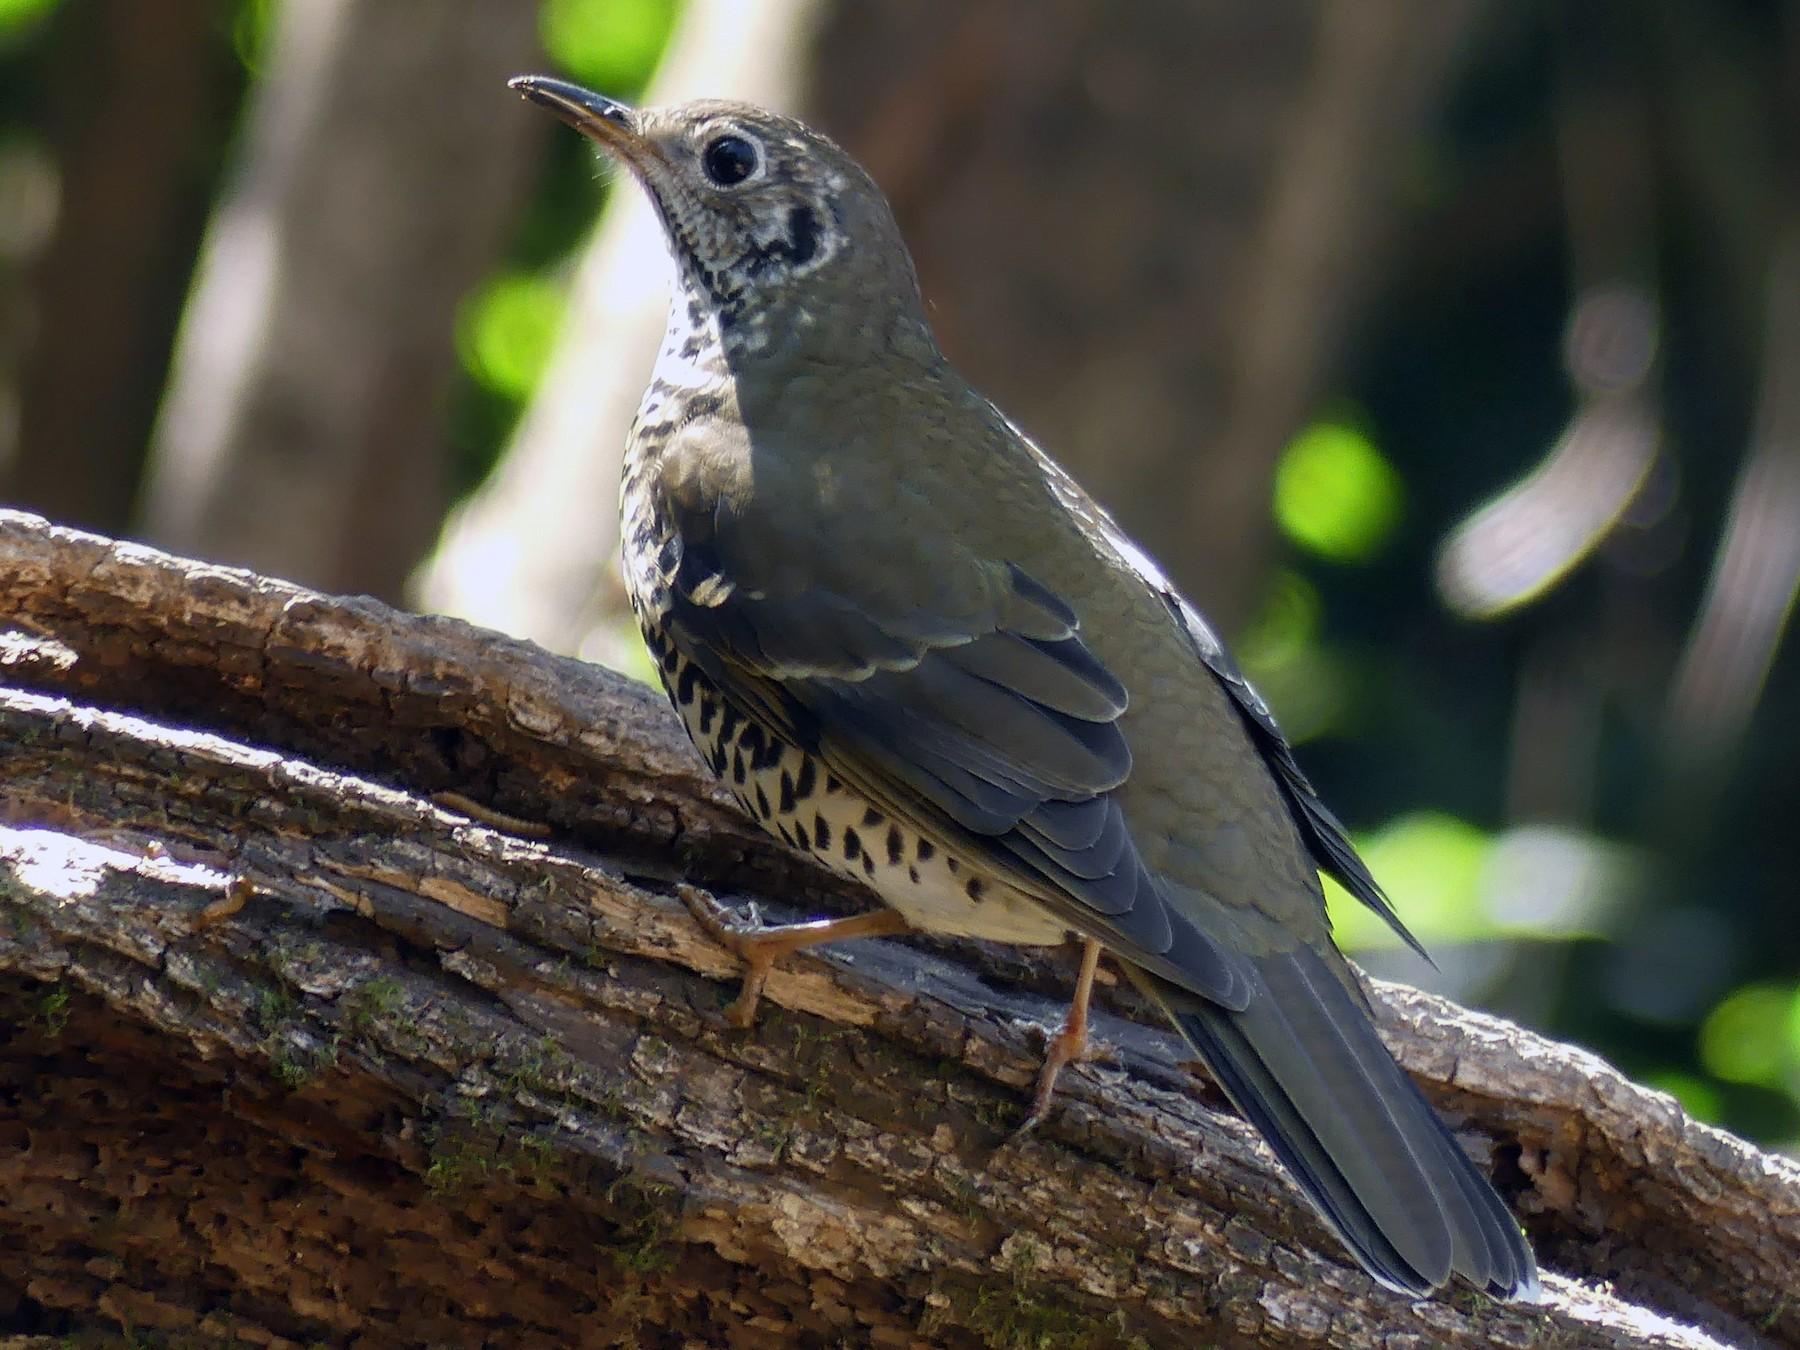 Long-tailed Thrush - Shelley Rutkin